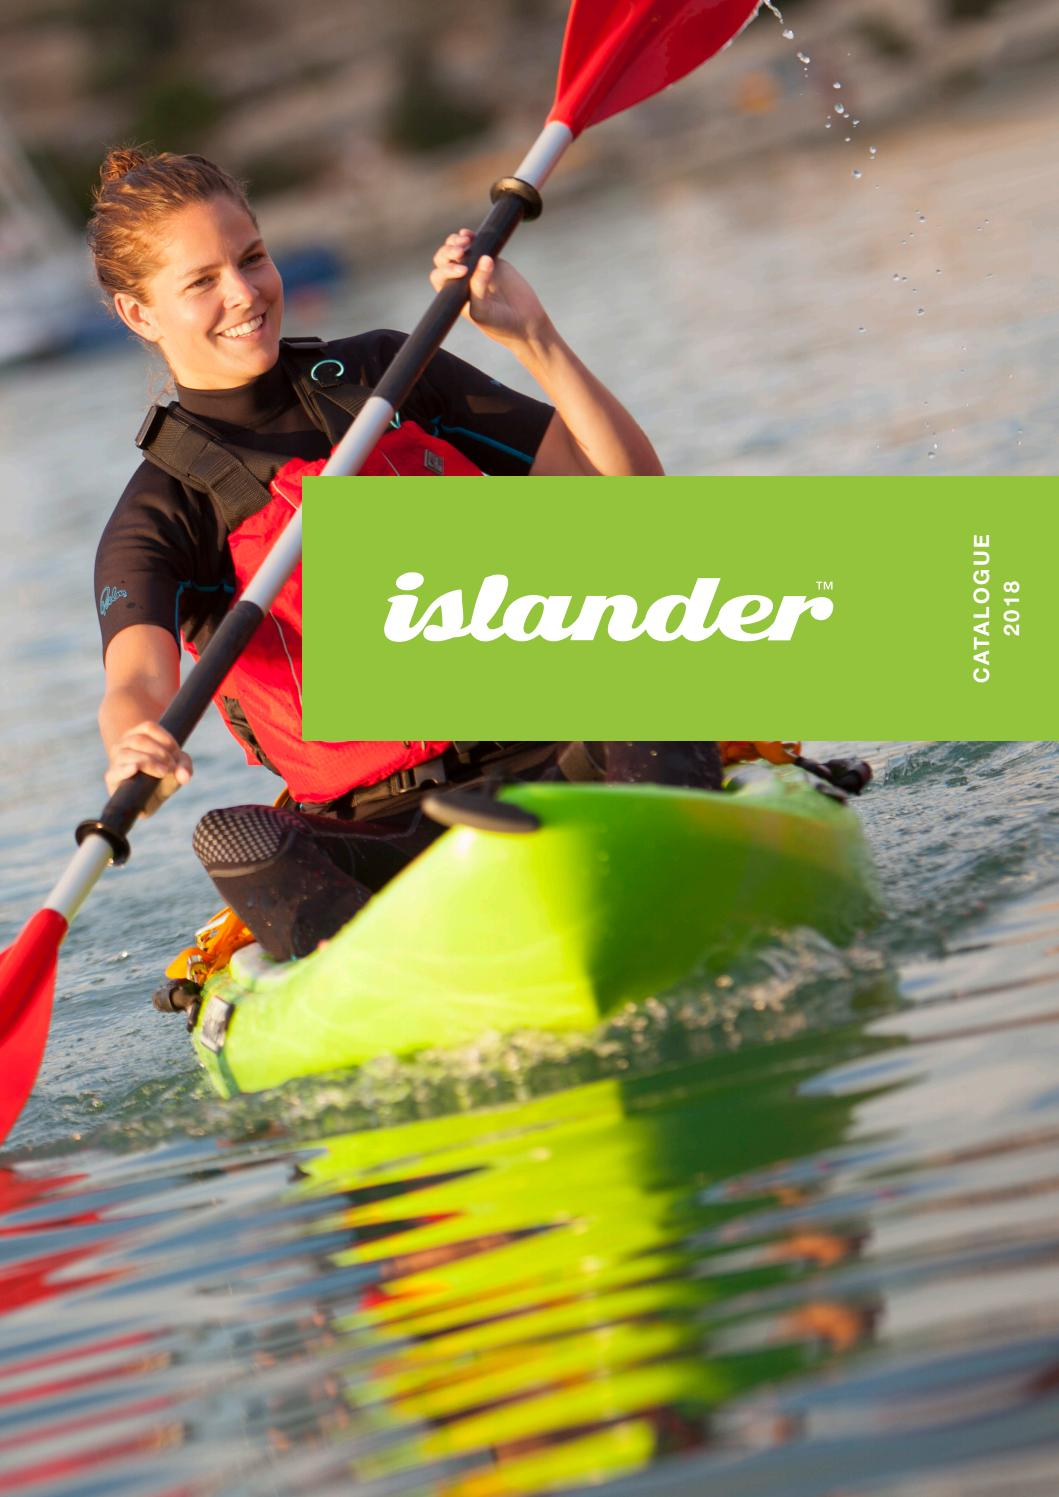 2018 Islander Kayaks catalogue by Palm Equipment - issuu